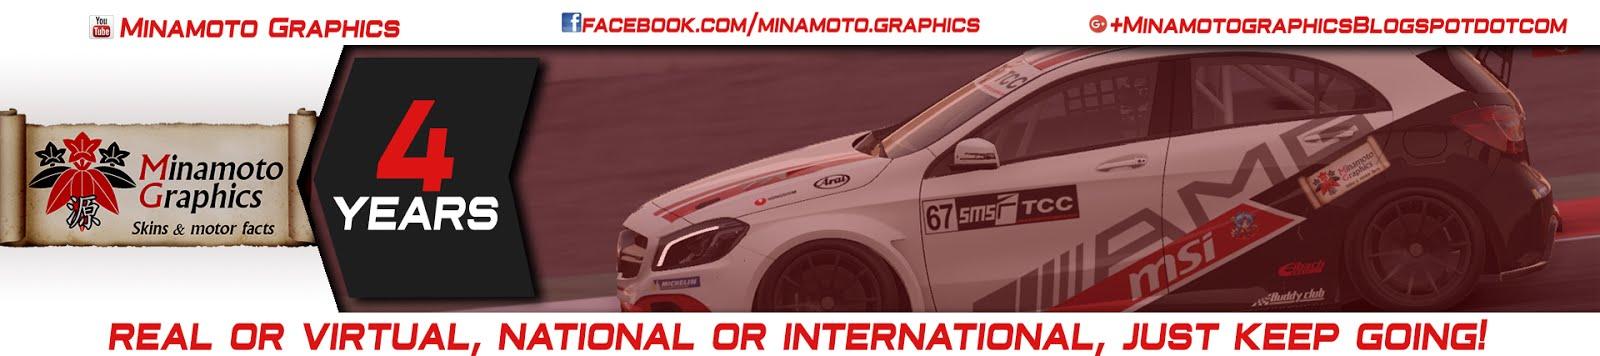 Minamoto Graphics